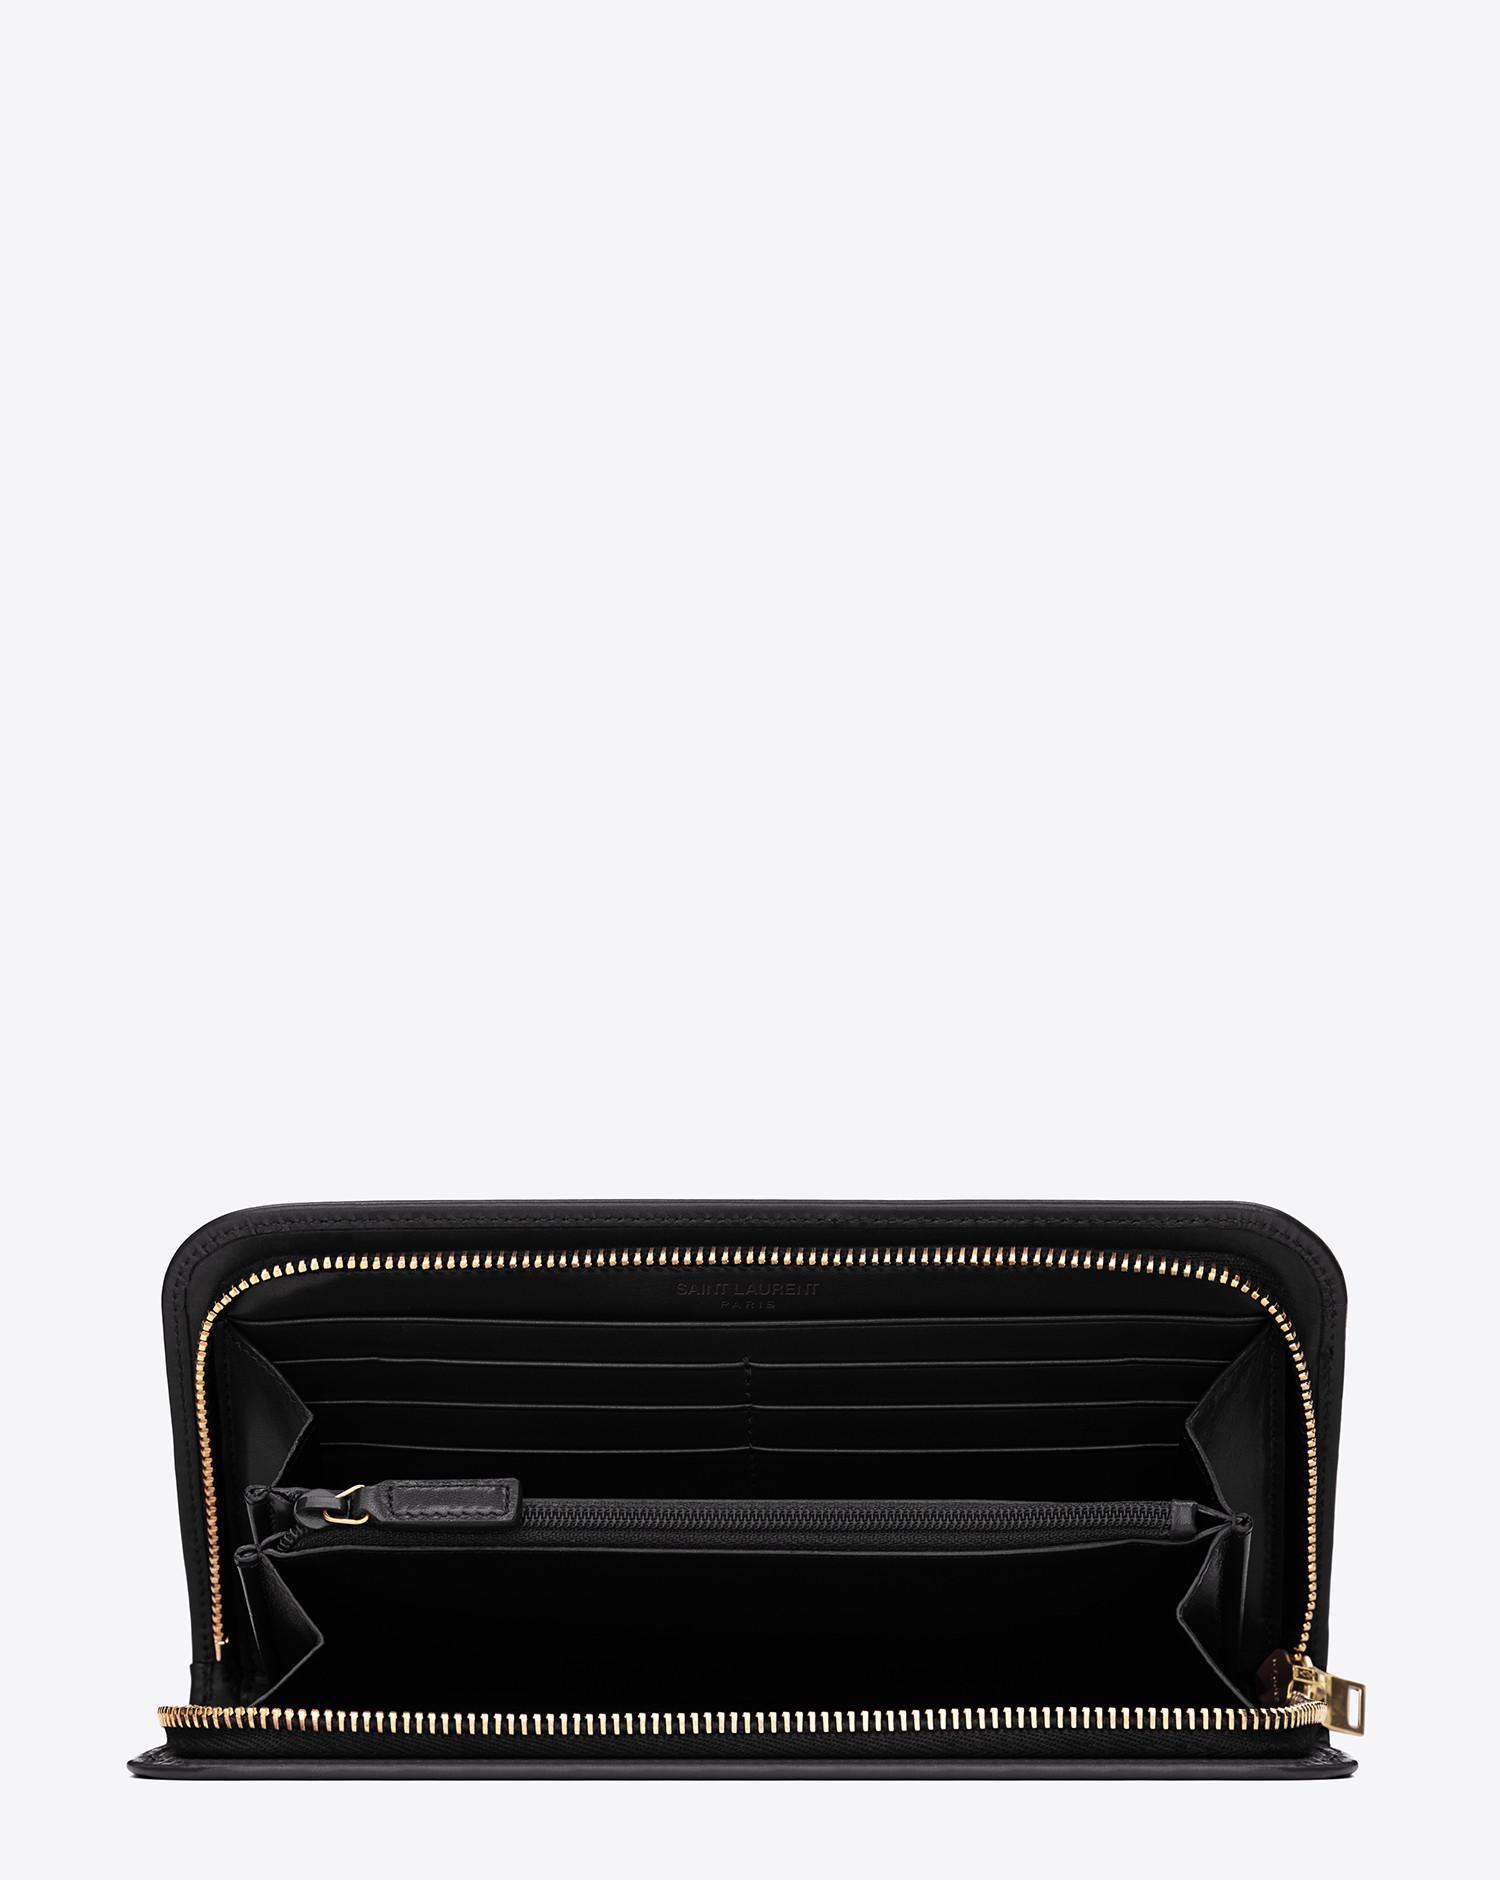 f30979c87f66 Lyst - Saint Laurent Paris Zip Around Wallet In Black Leather in Black